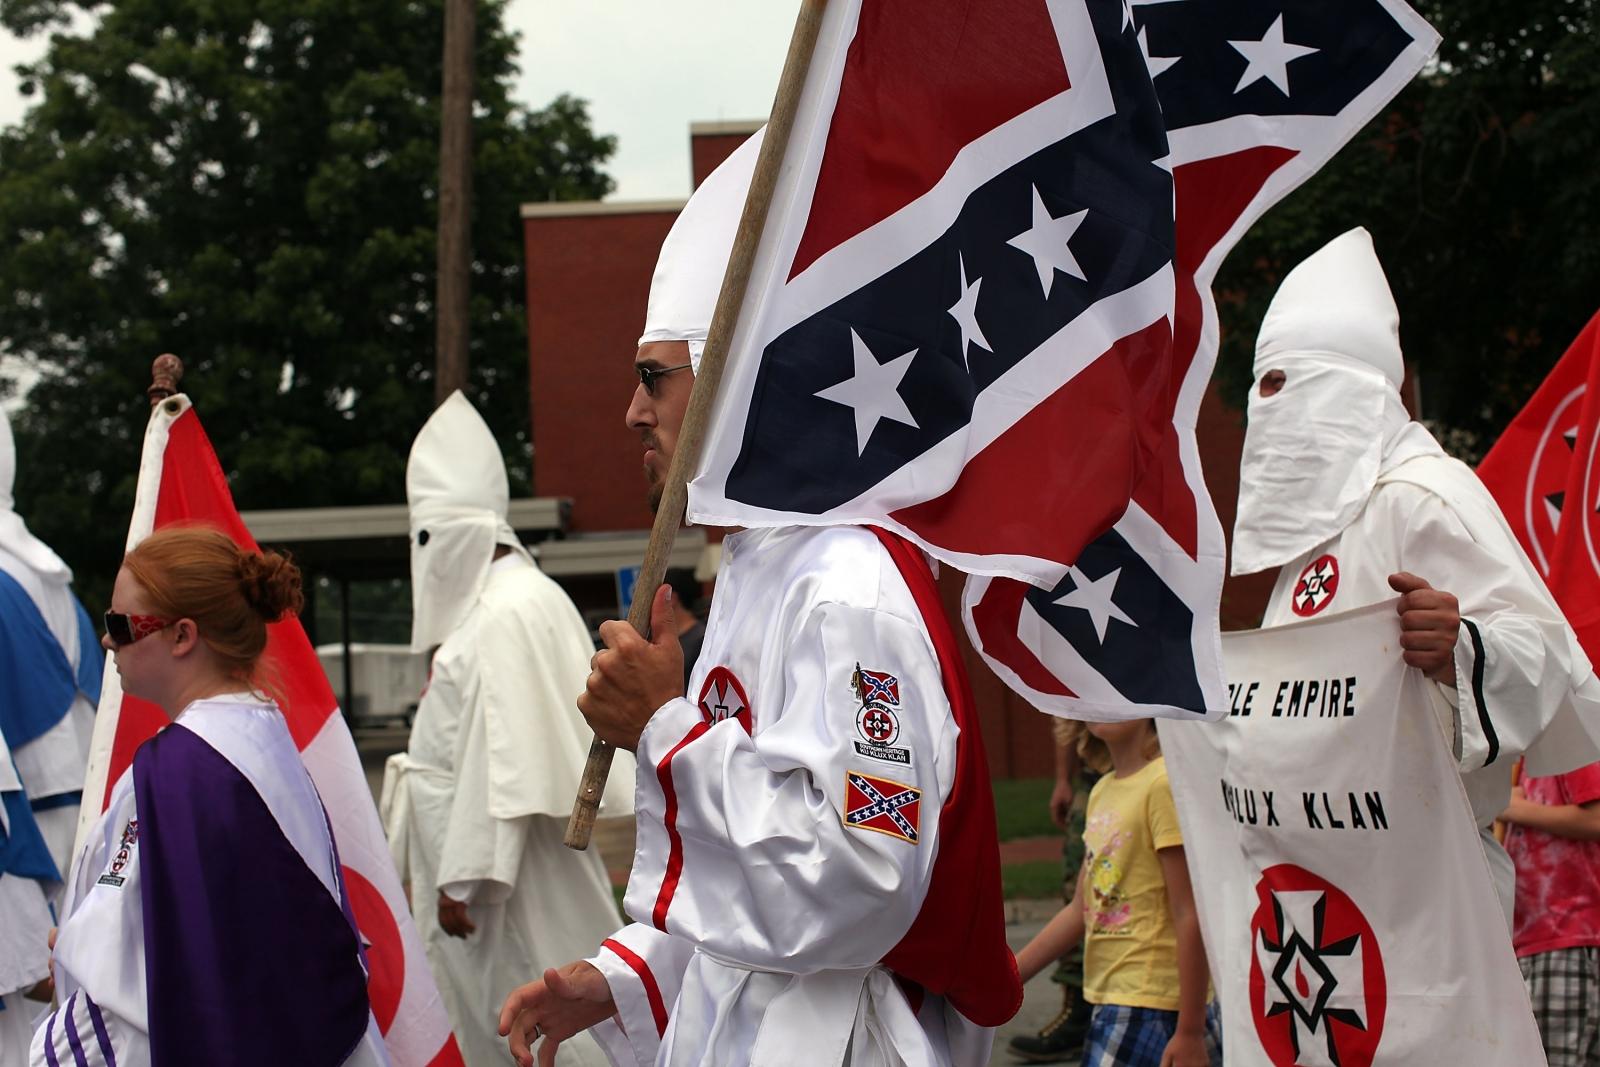 Klan members hold